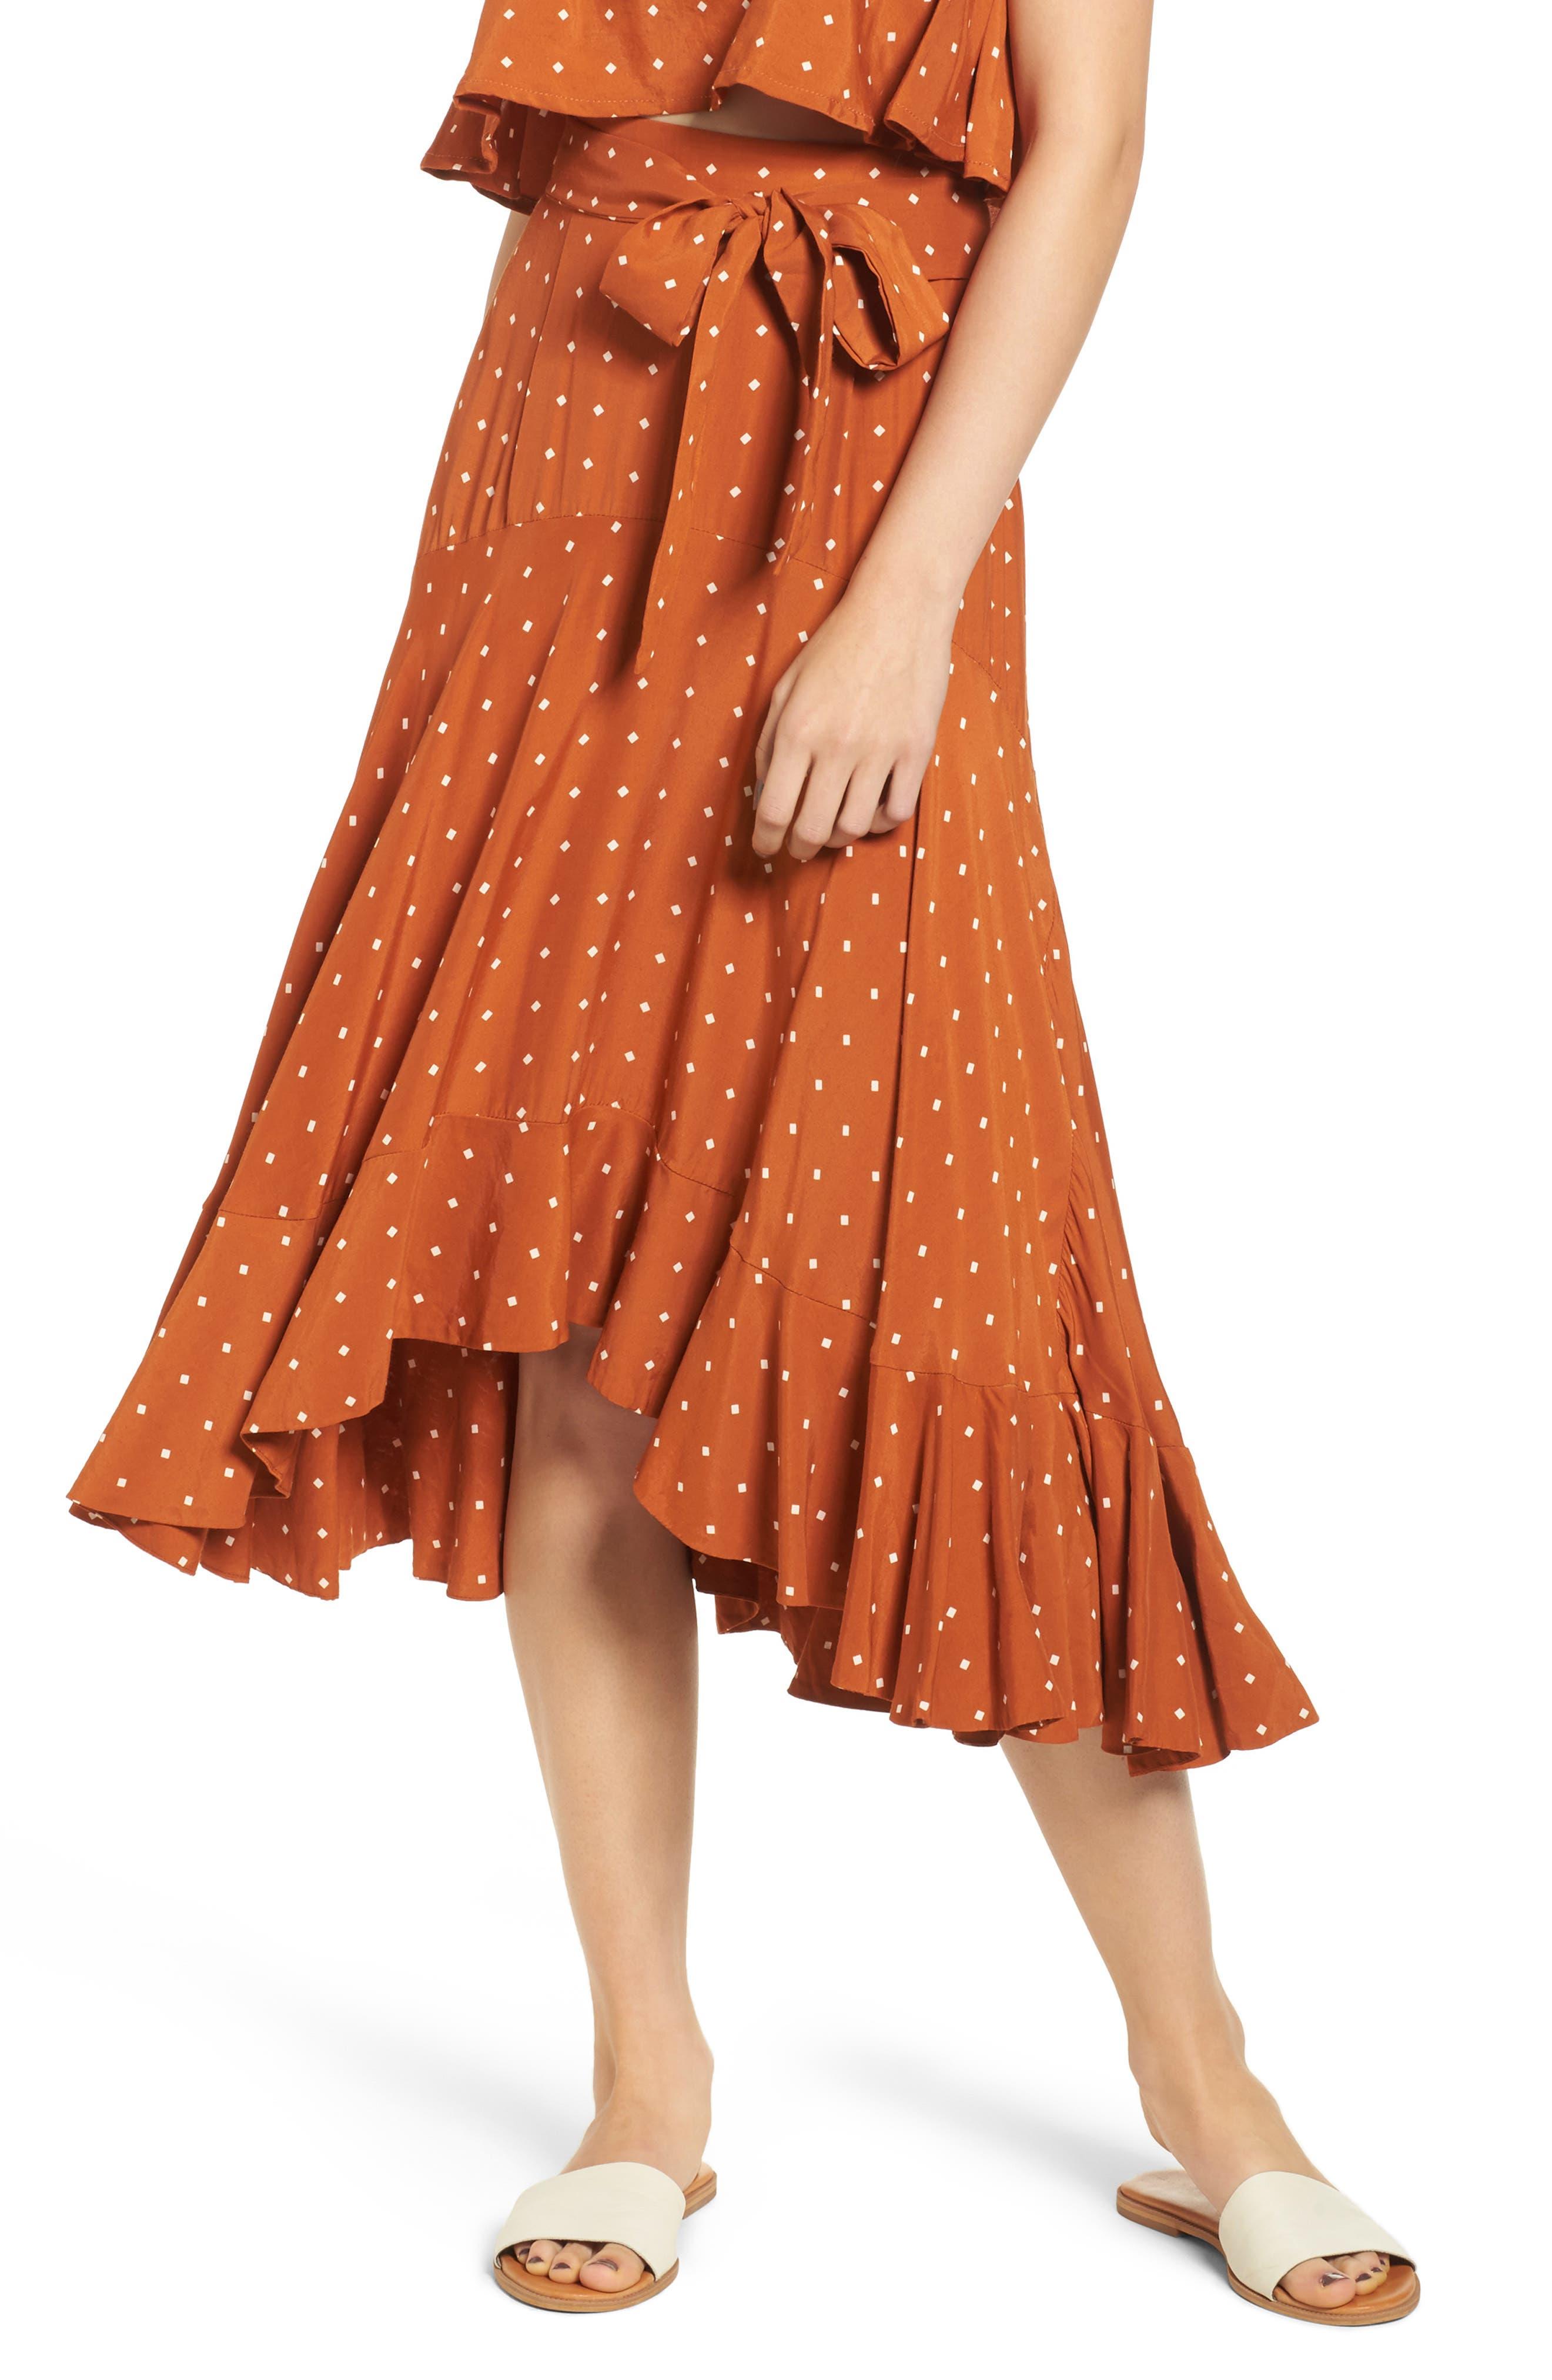 FAITHFULL THE BRAND Kamares Polka Dot Midi Skirt, Main, color, 700